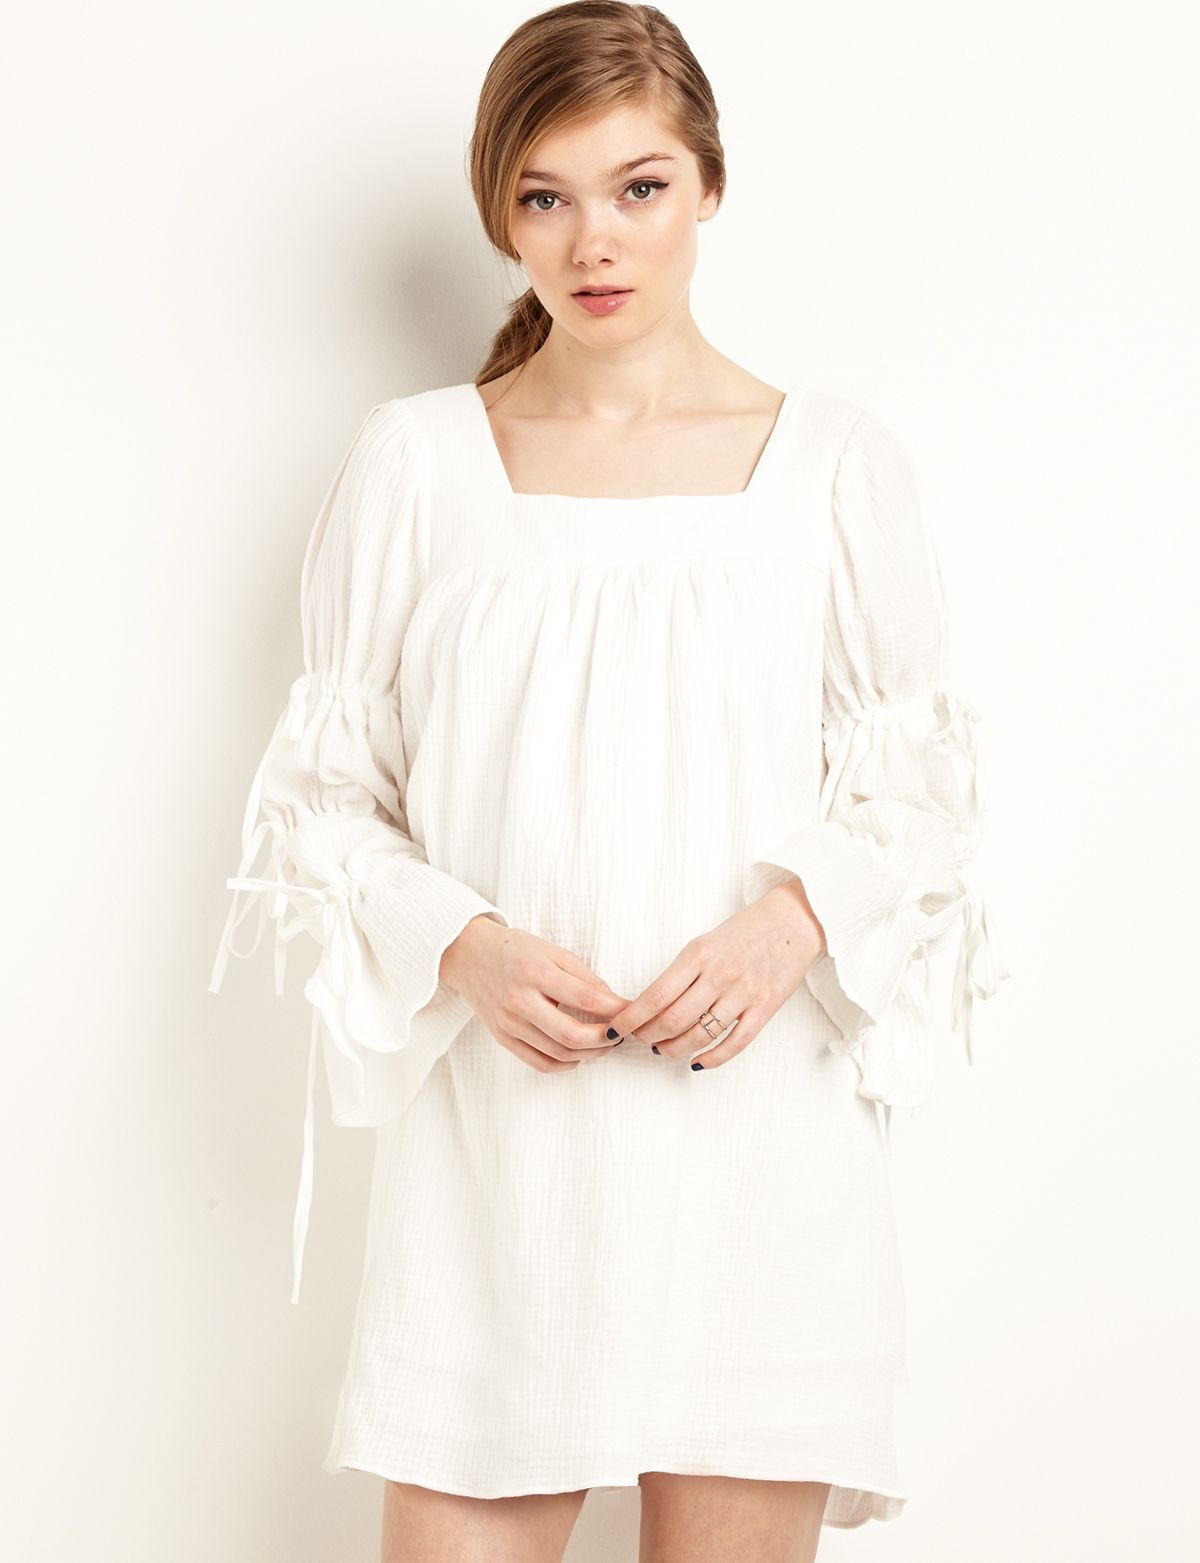 21f7e21db54ca White Sleeve Tie Baby Doll Dress  fashion  pixiemarket